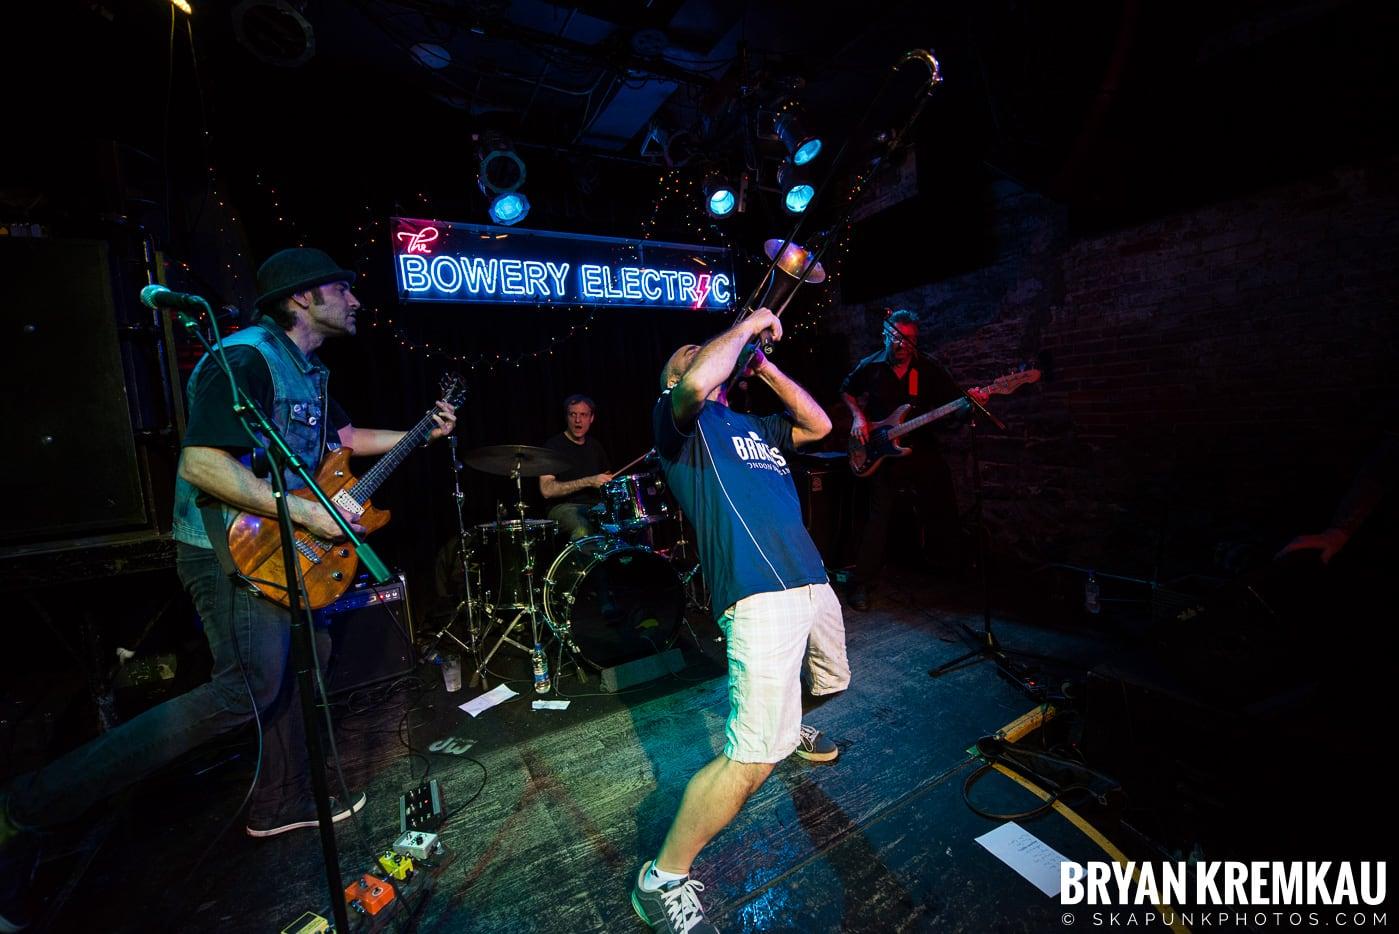 Cenzo @ Bowery Electric, NYC - 11.17.18 (15)